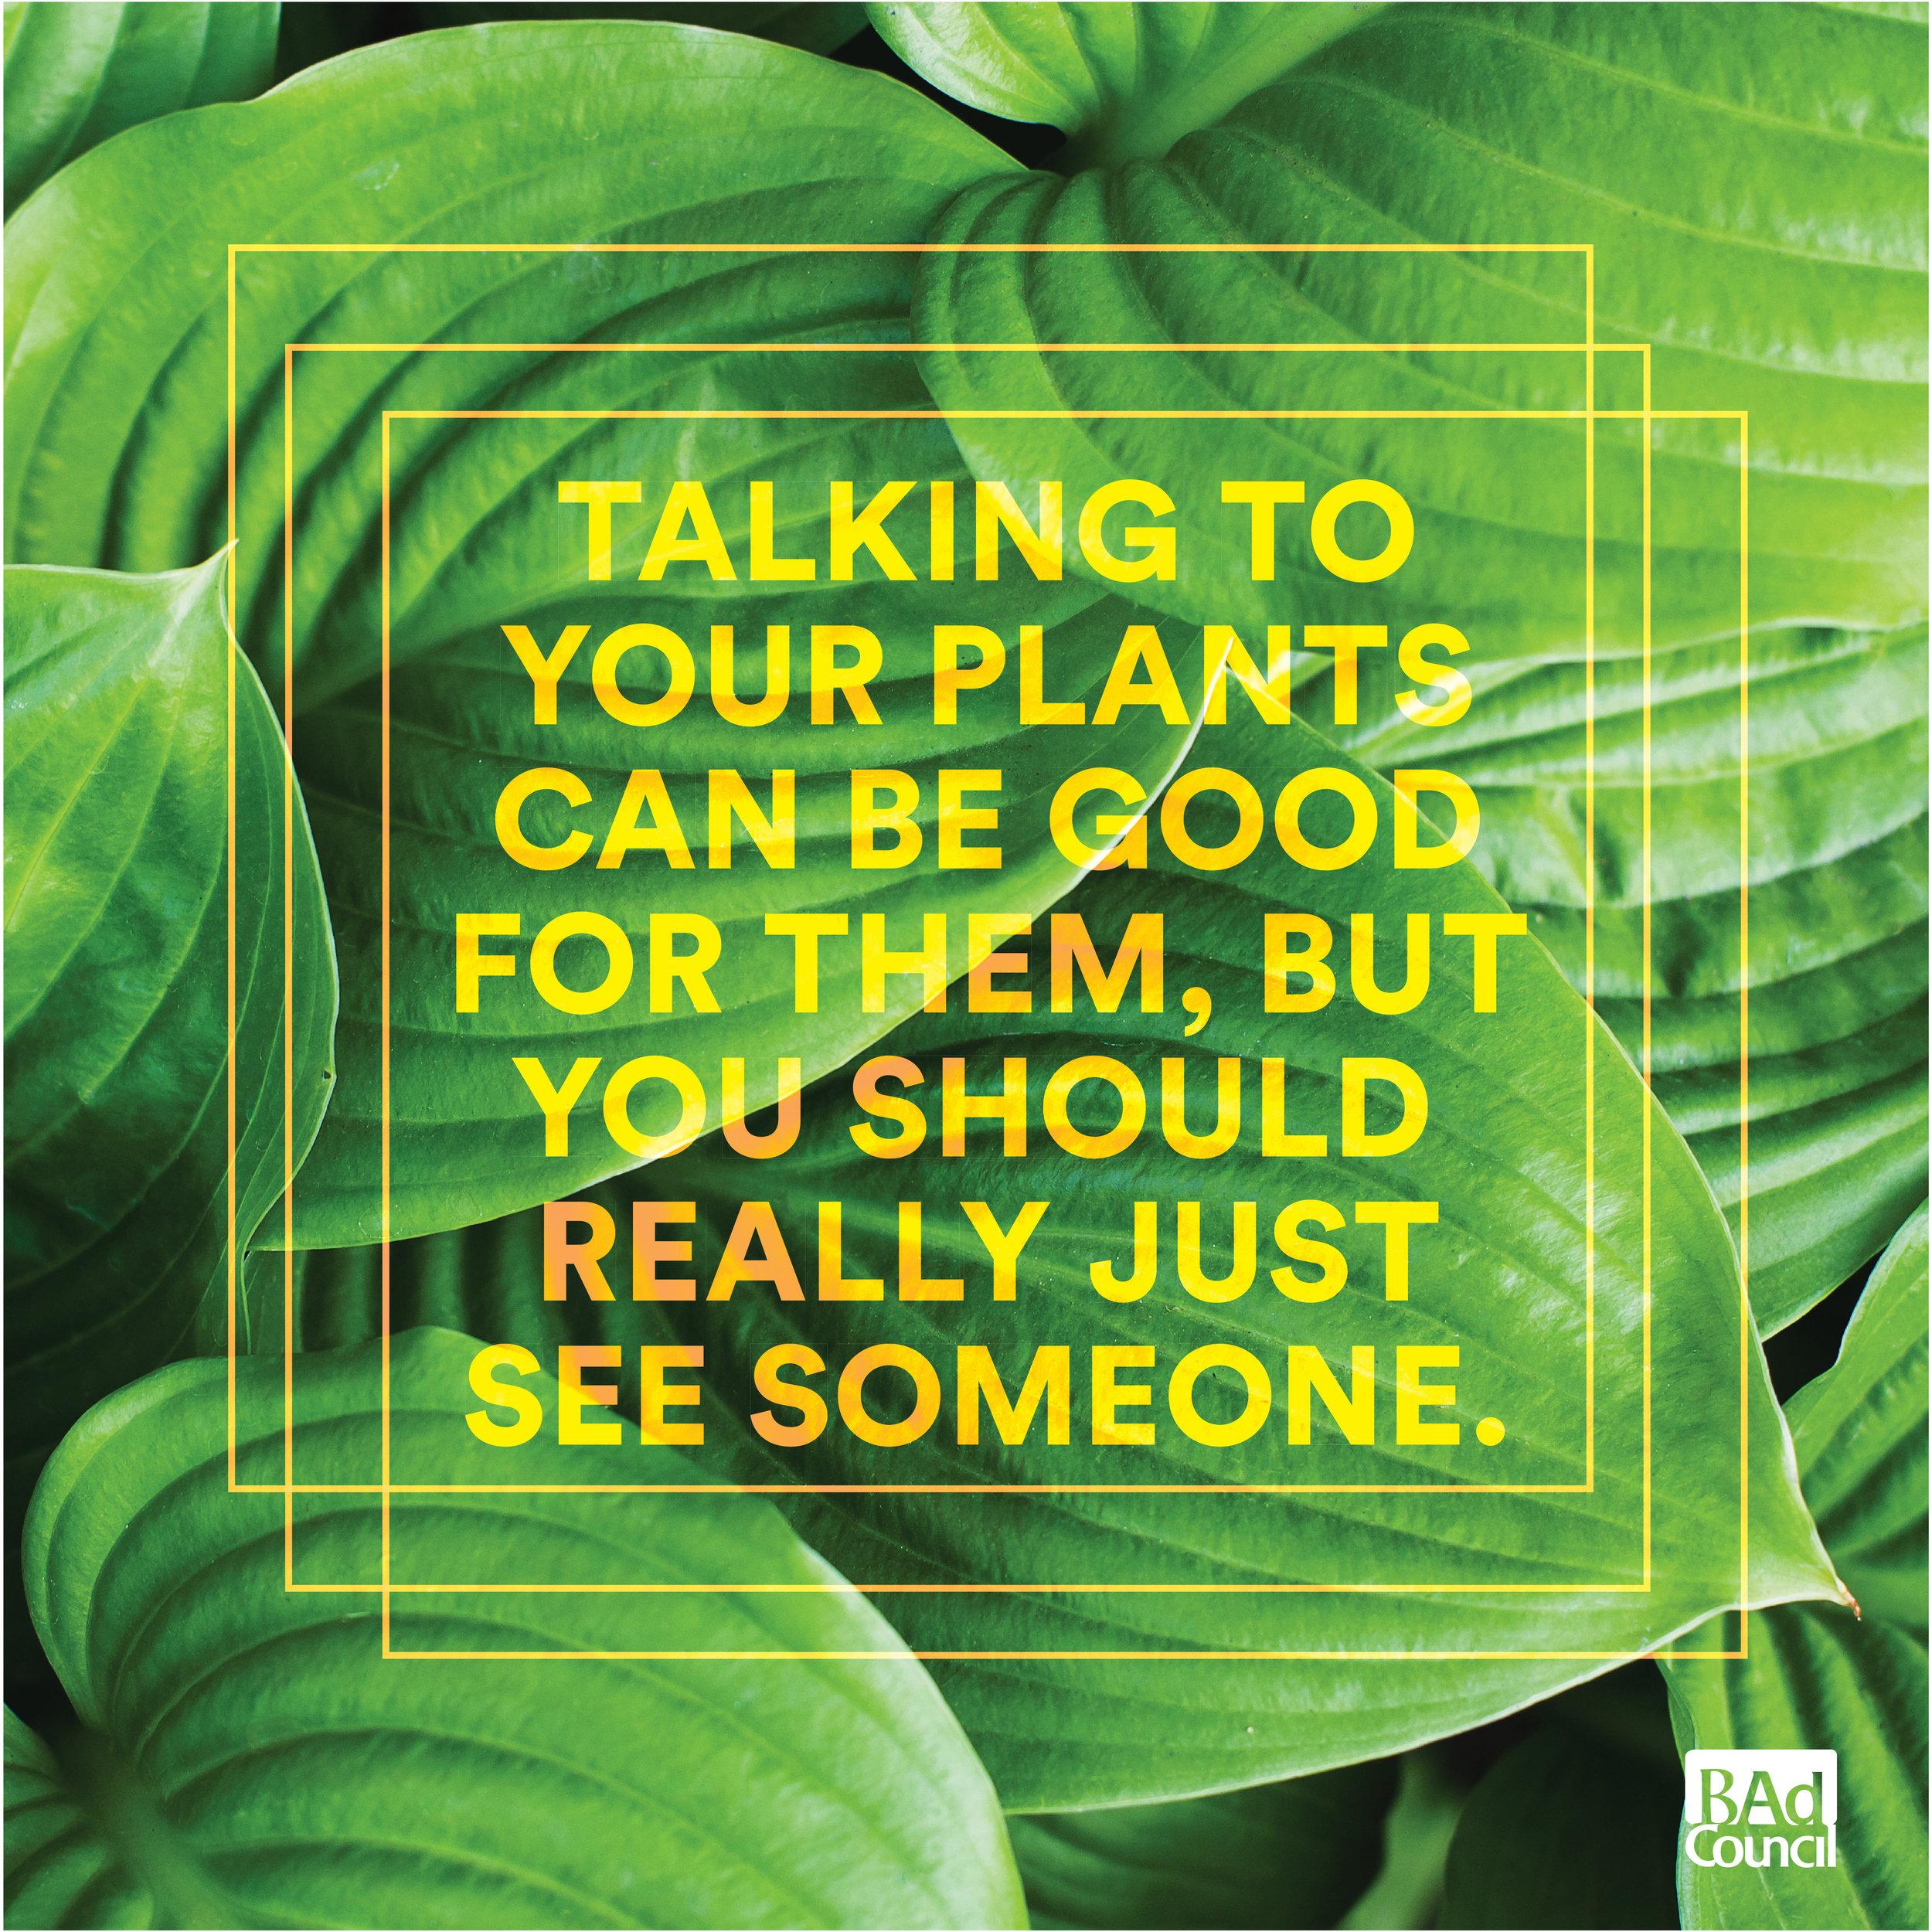 talkingtoplants.jpg